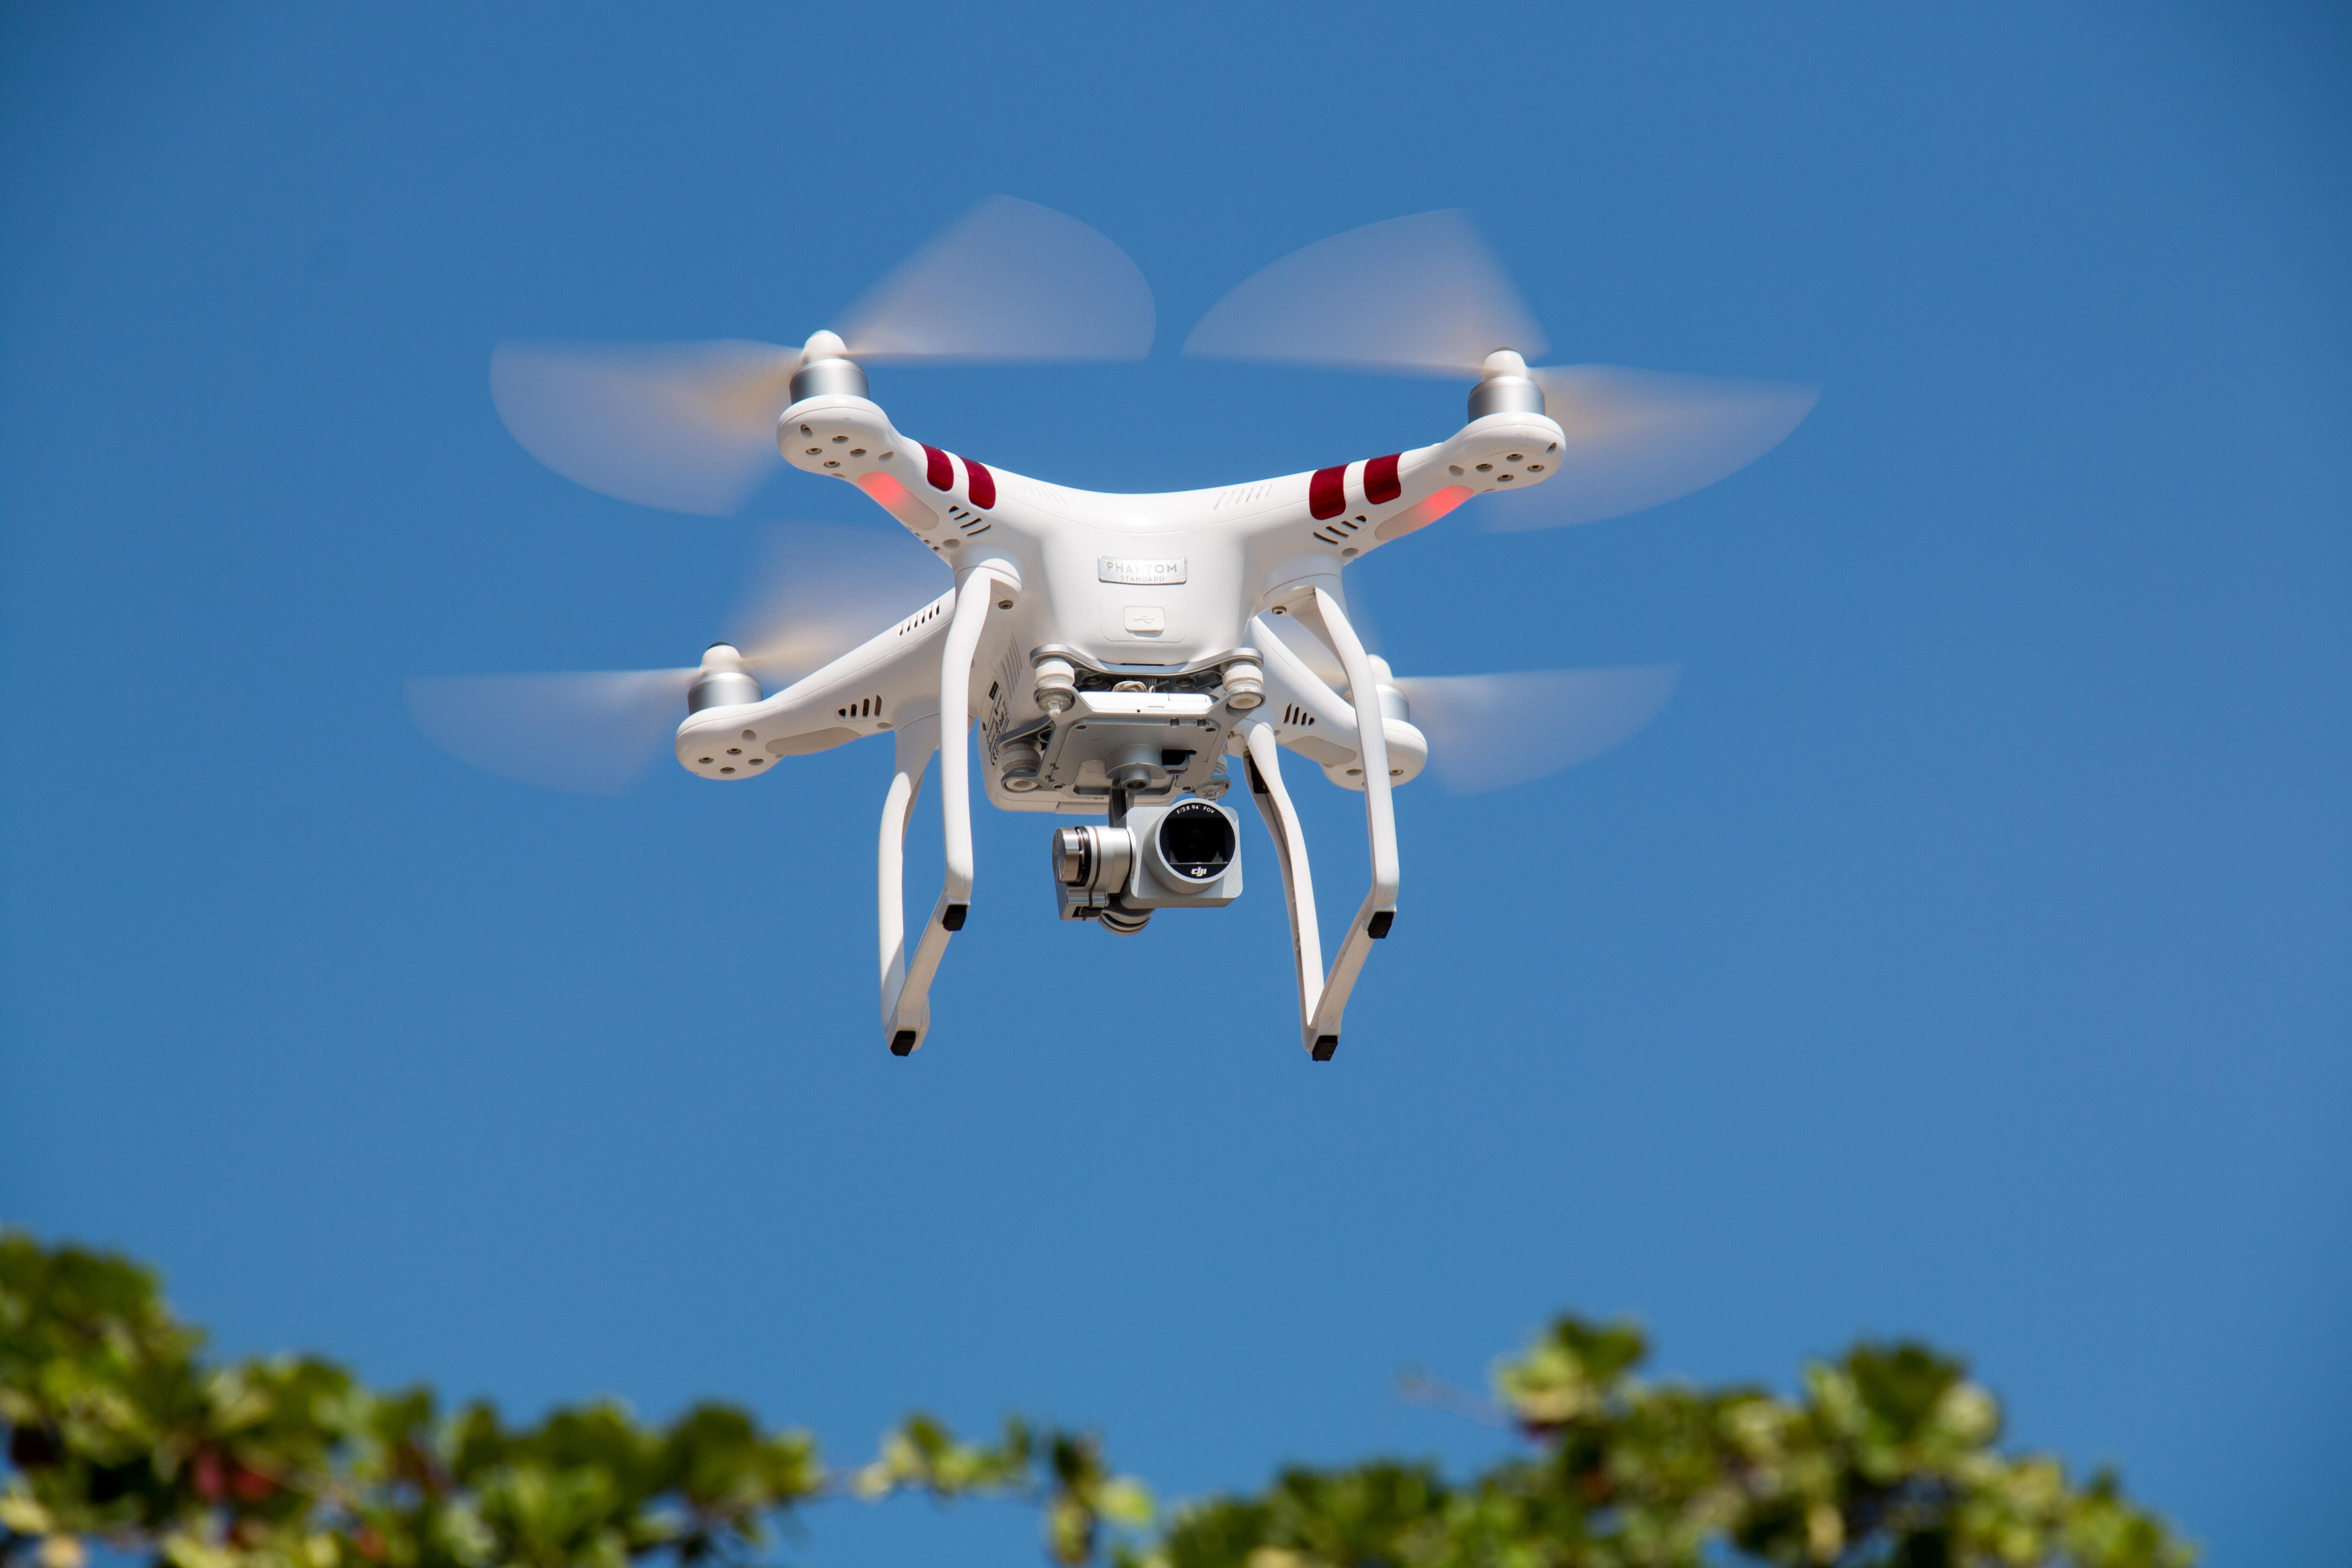 drone lennossa